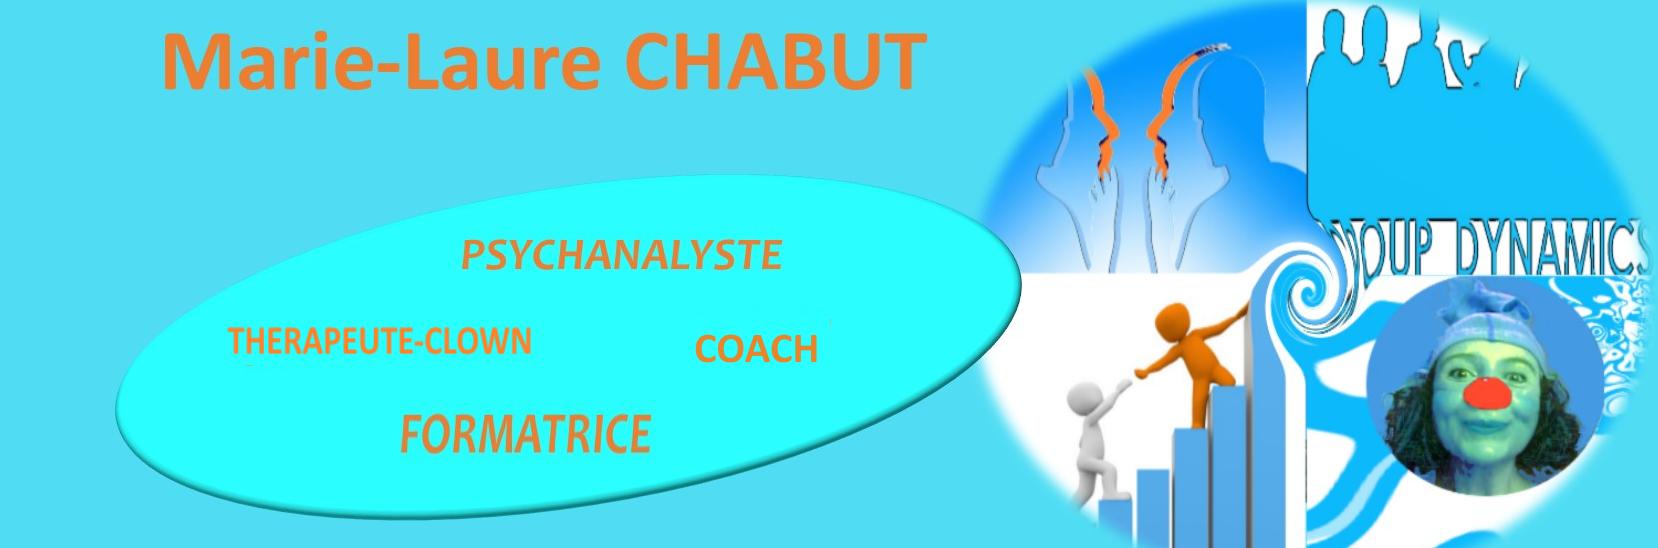 MARIE-LAURE CHABUT  -     PSYCHANALYSTE  -  FORMATRICE